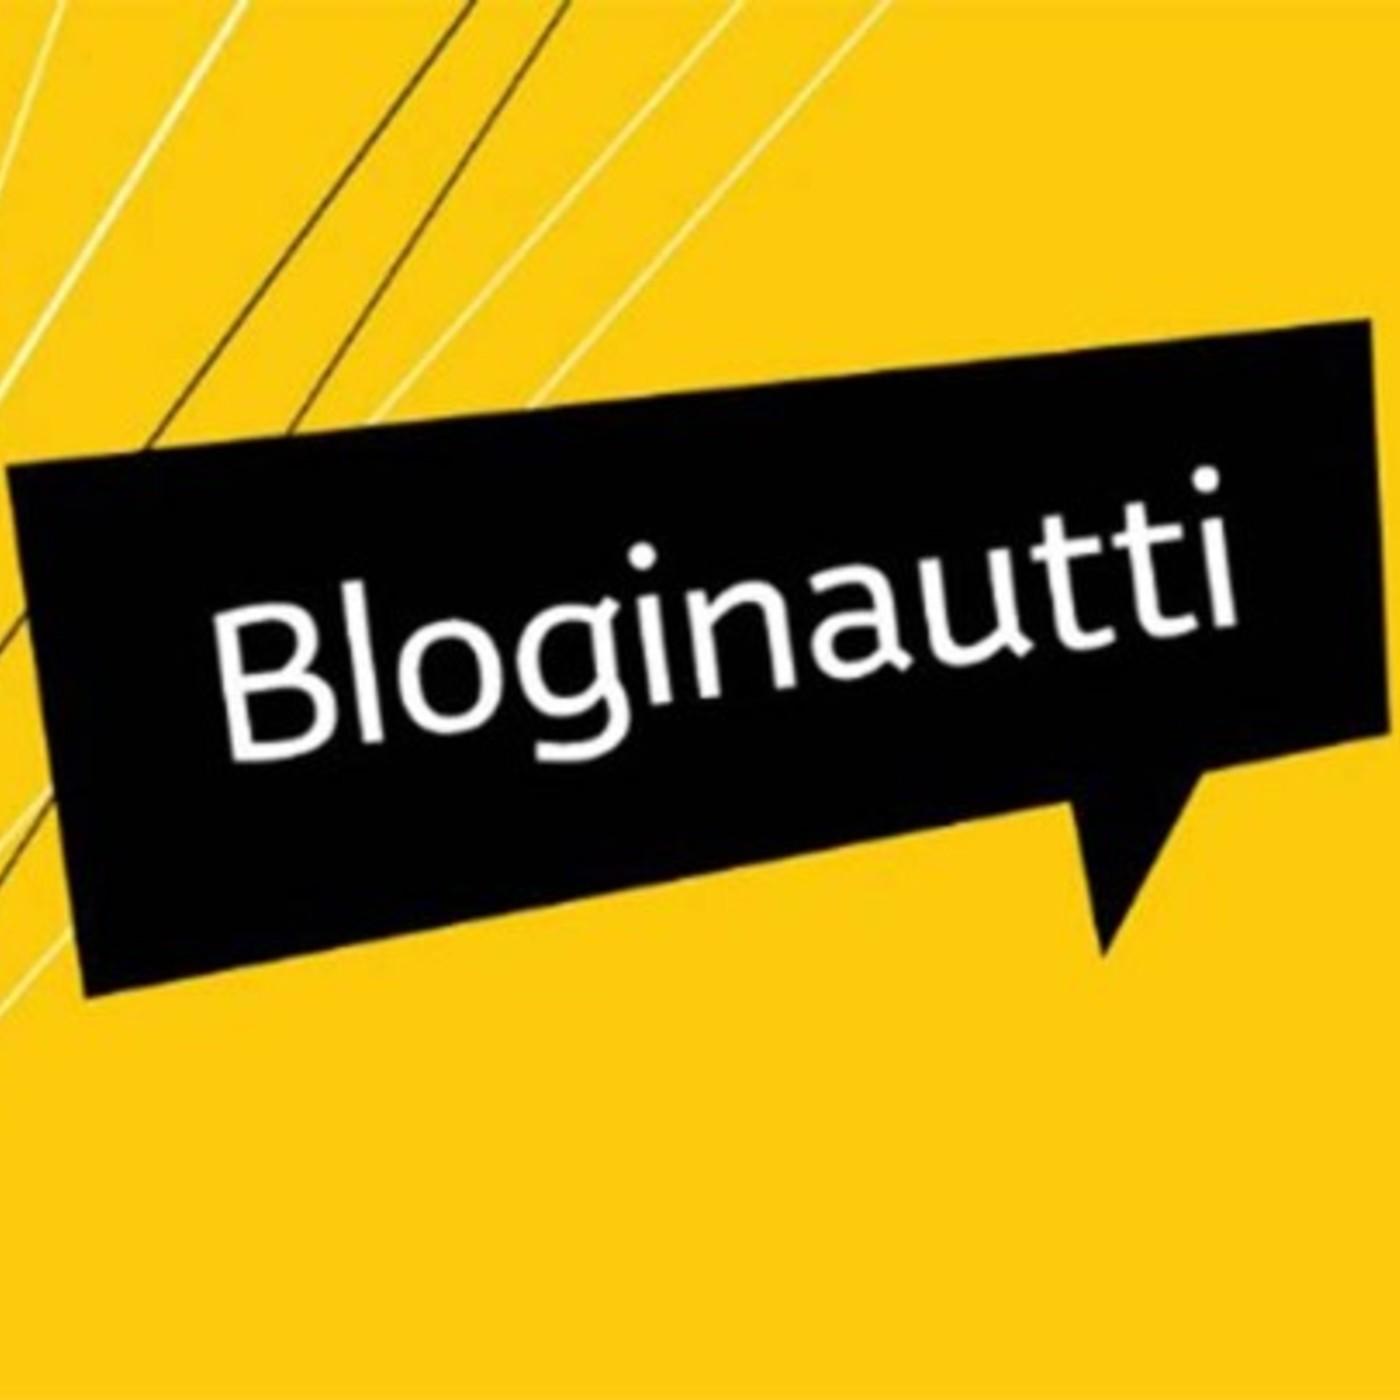 <![CDATA[Bloginautti]]>